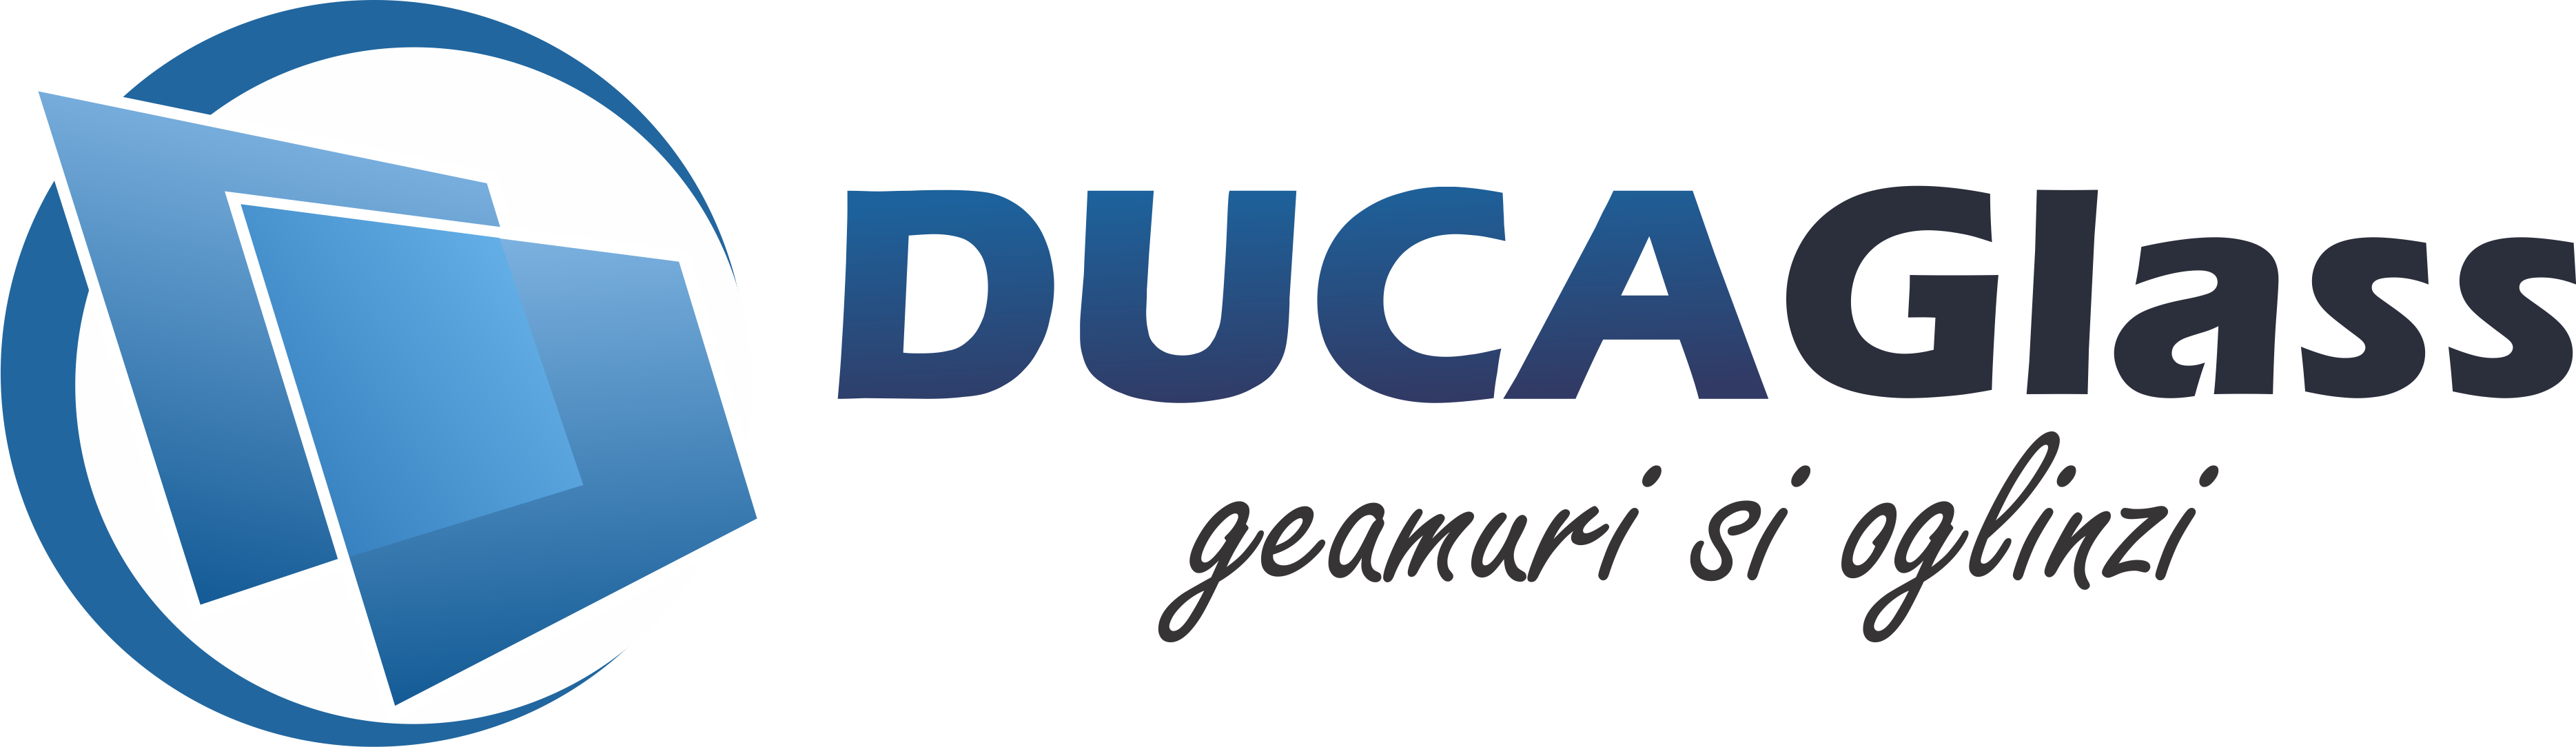 DucaGlass